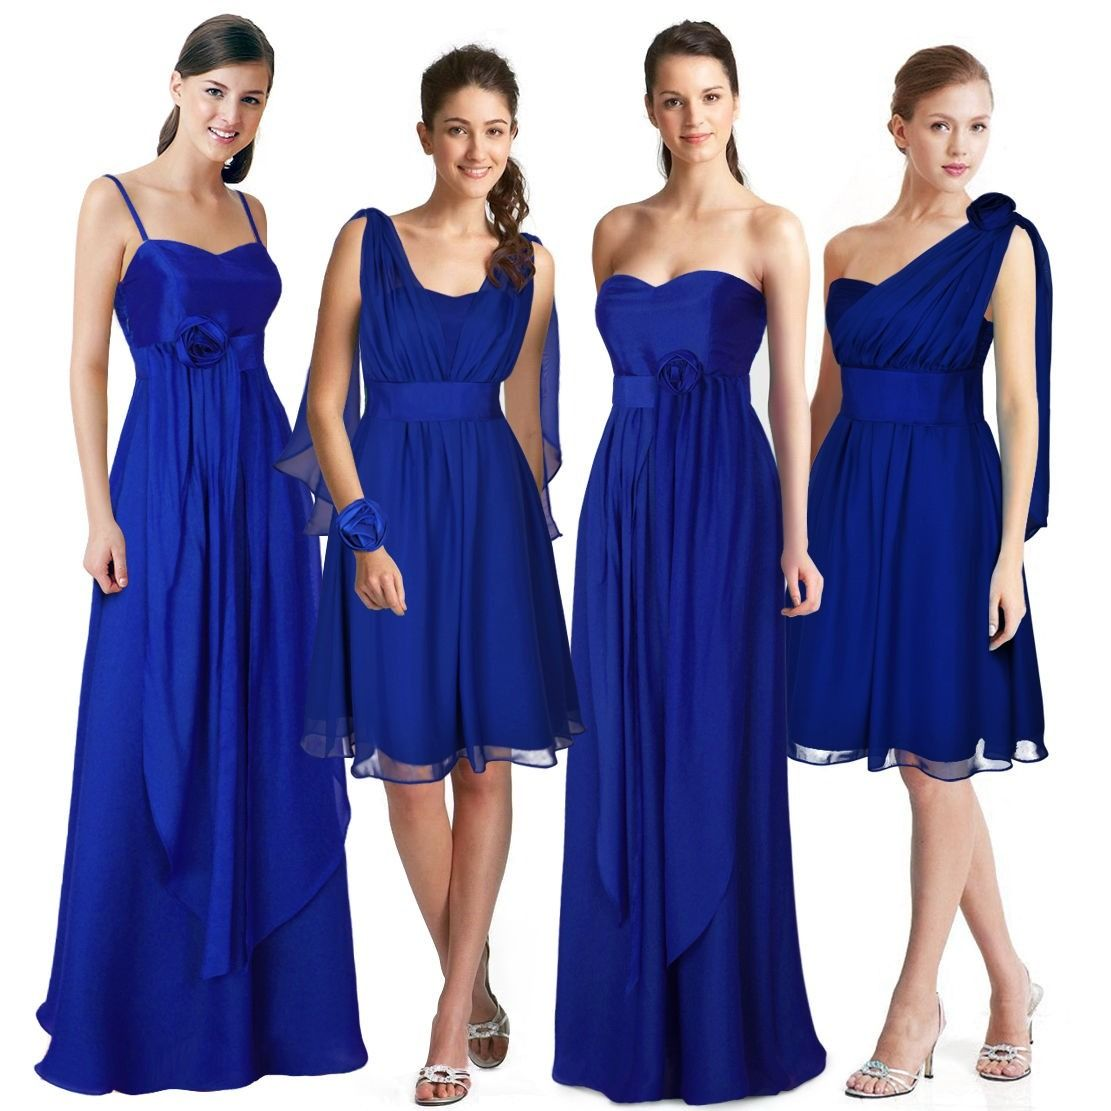 dama de honor - Buscar con Google   vestidos   Pinterest   Damitas ...